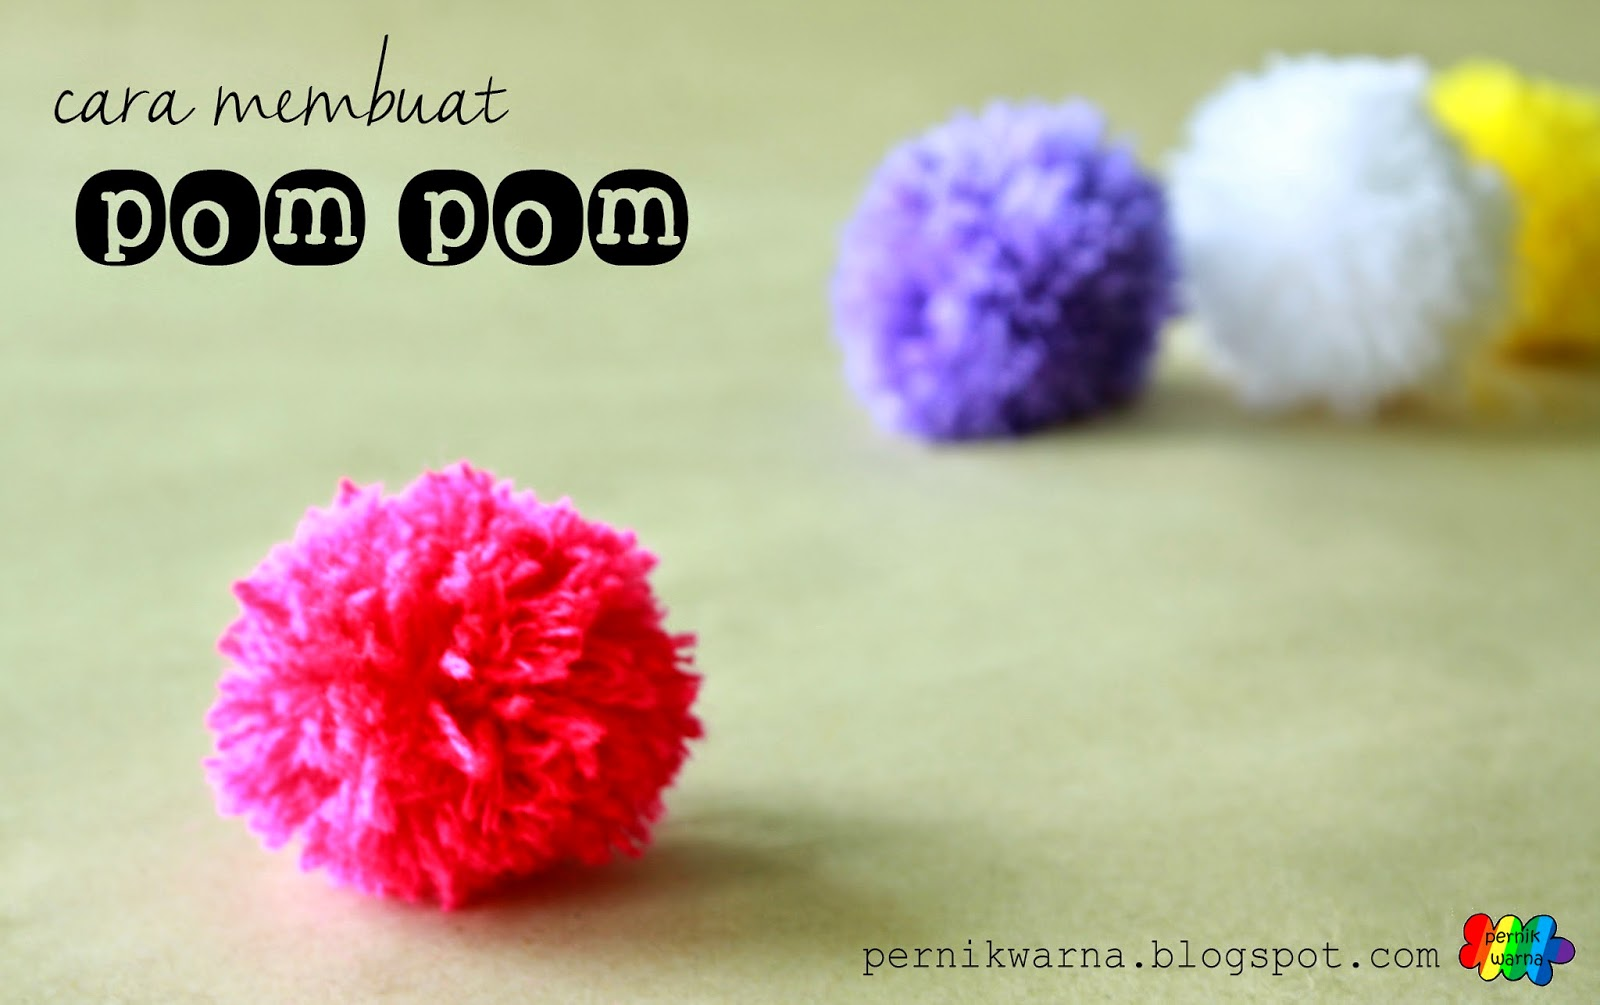 Pernik Warna Cara Membuat Pom Pom